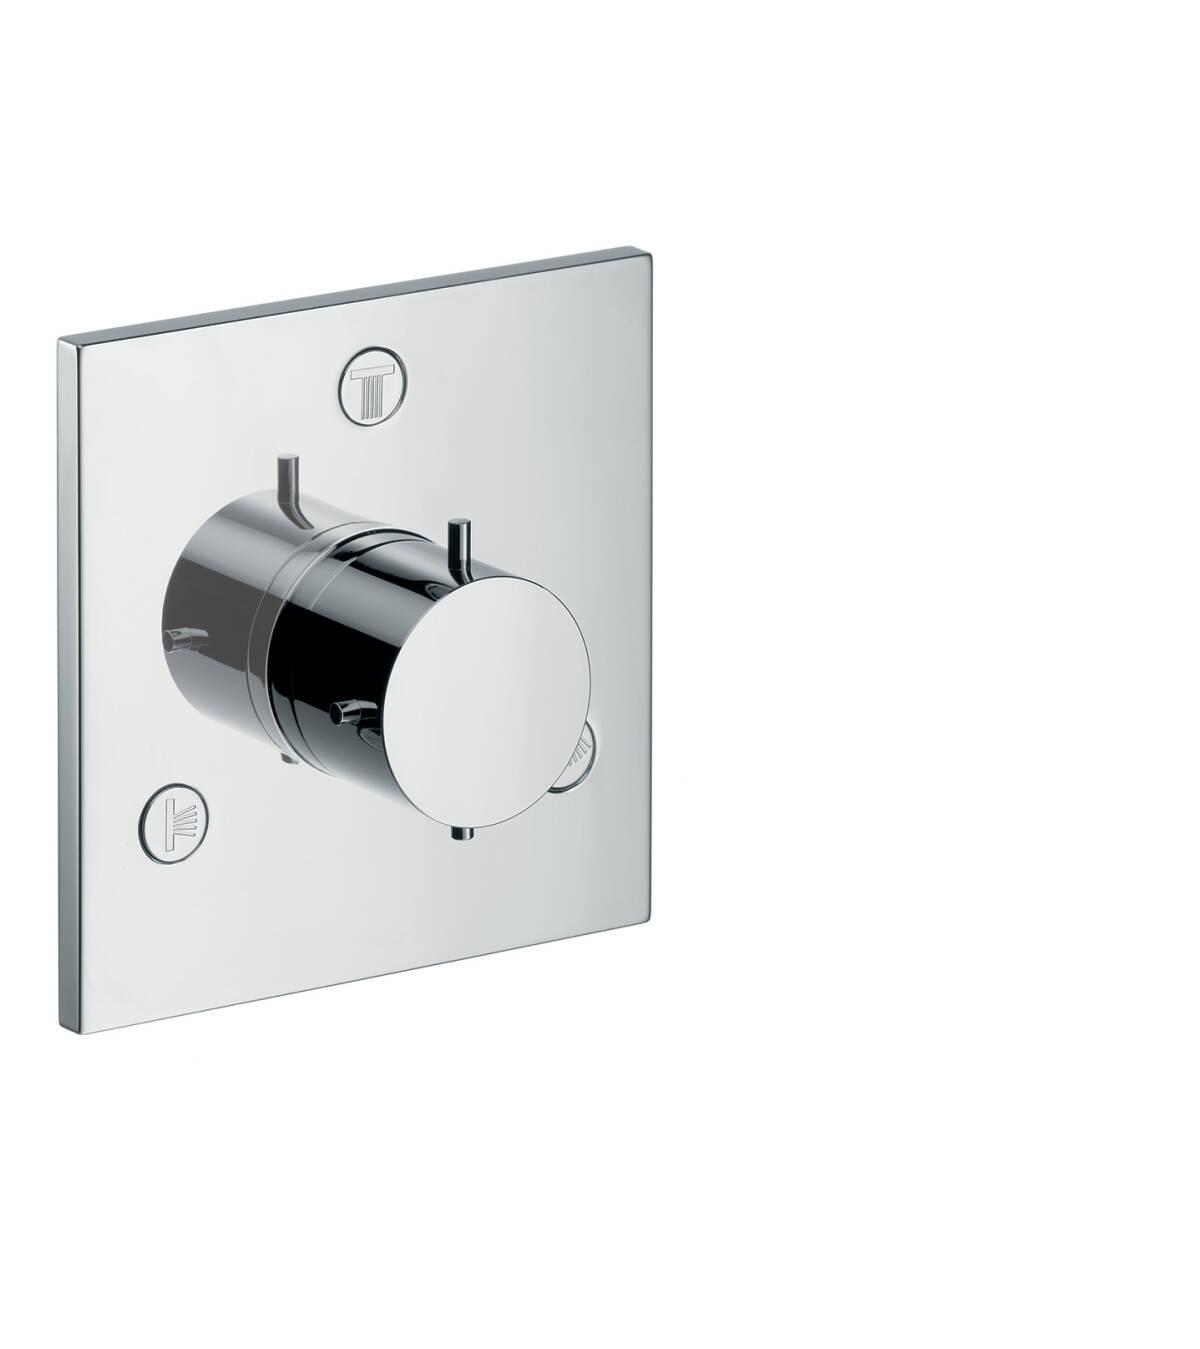 Shut-off/ diverter valve Trio/ Quattro for concealed installation, Brushed Bronze, 10934140